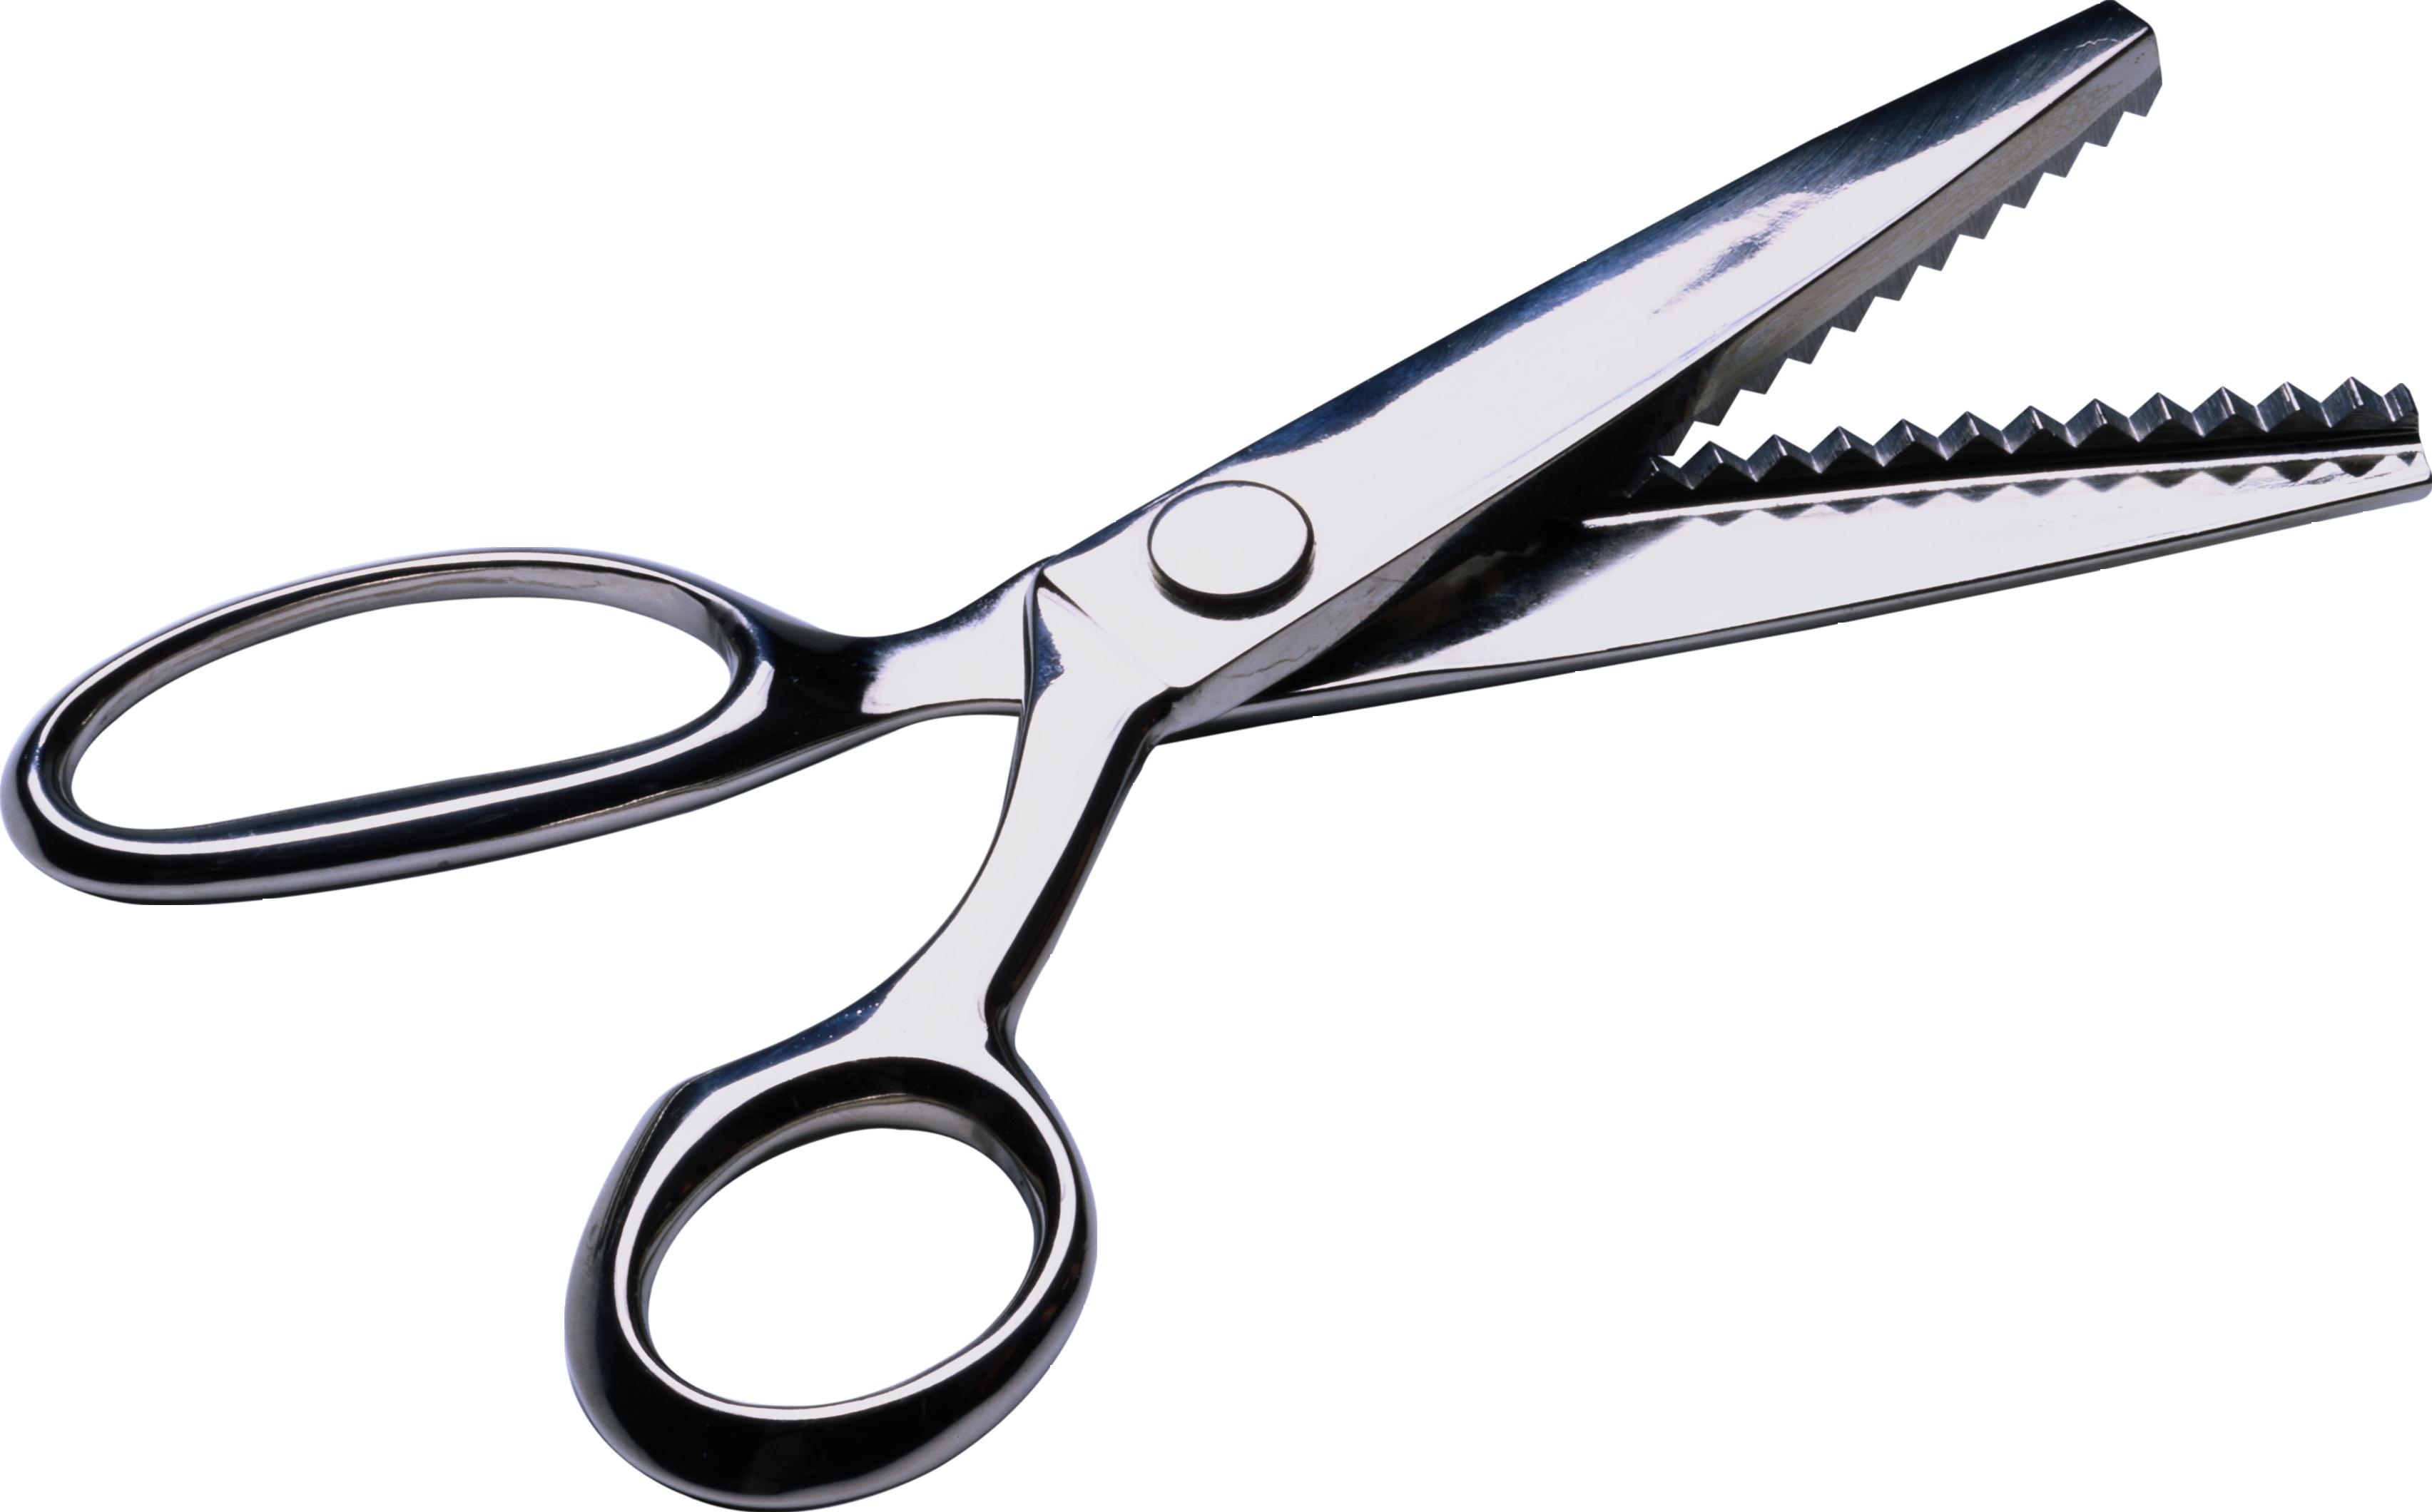 Blade clipart shears Images scissors Scissors image clipart